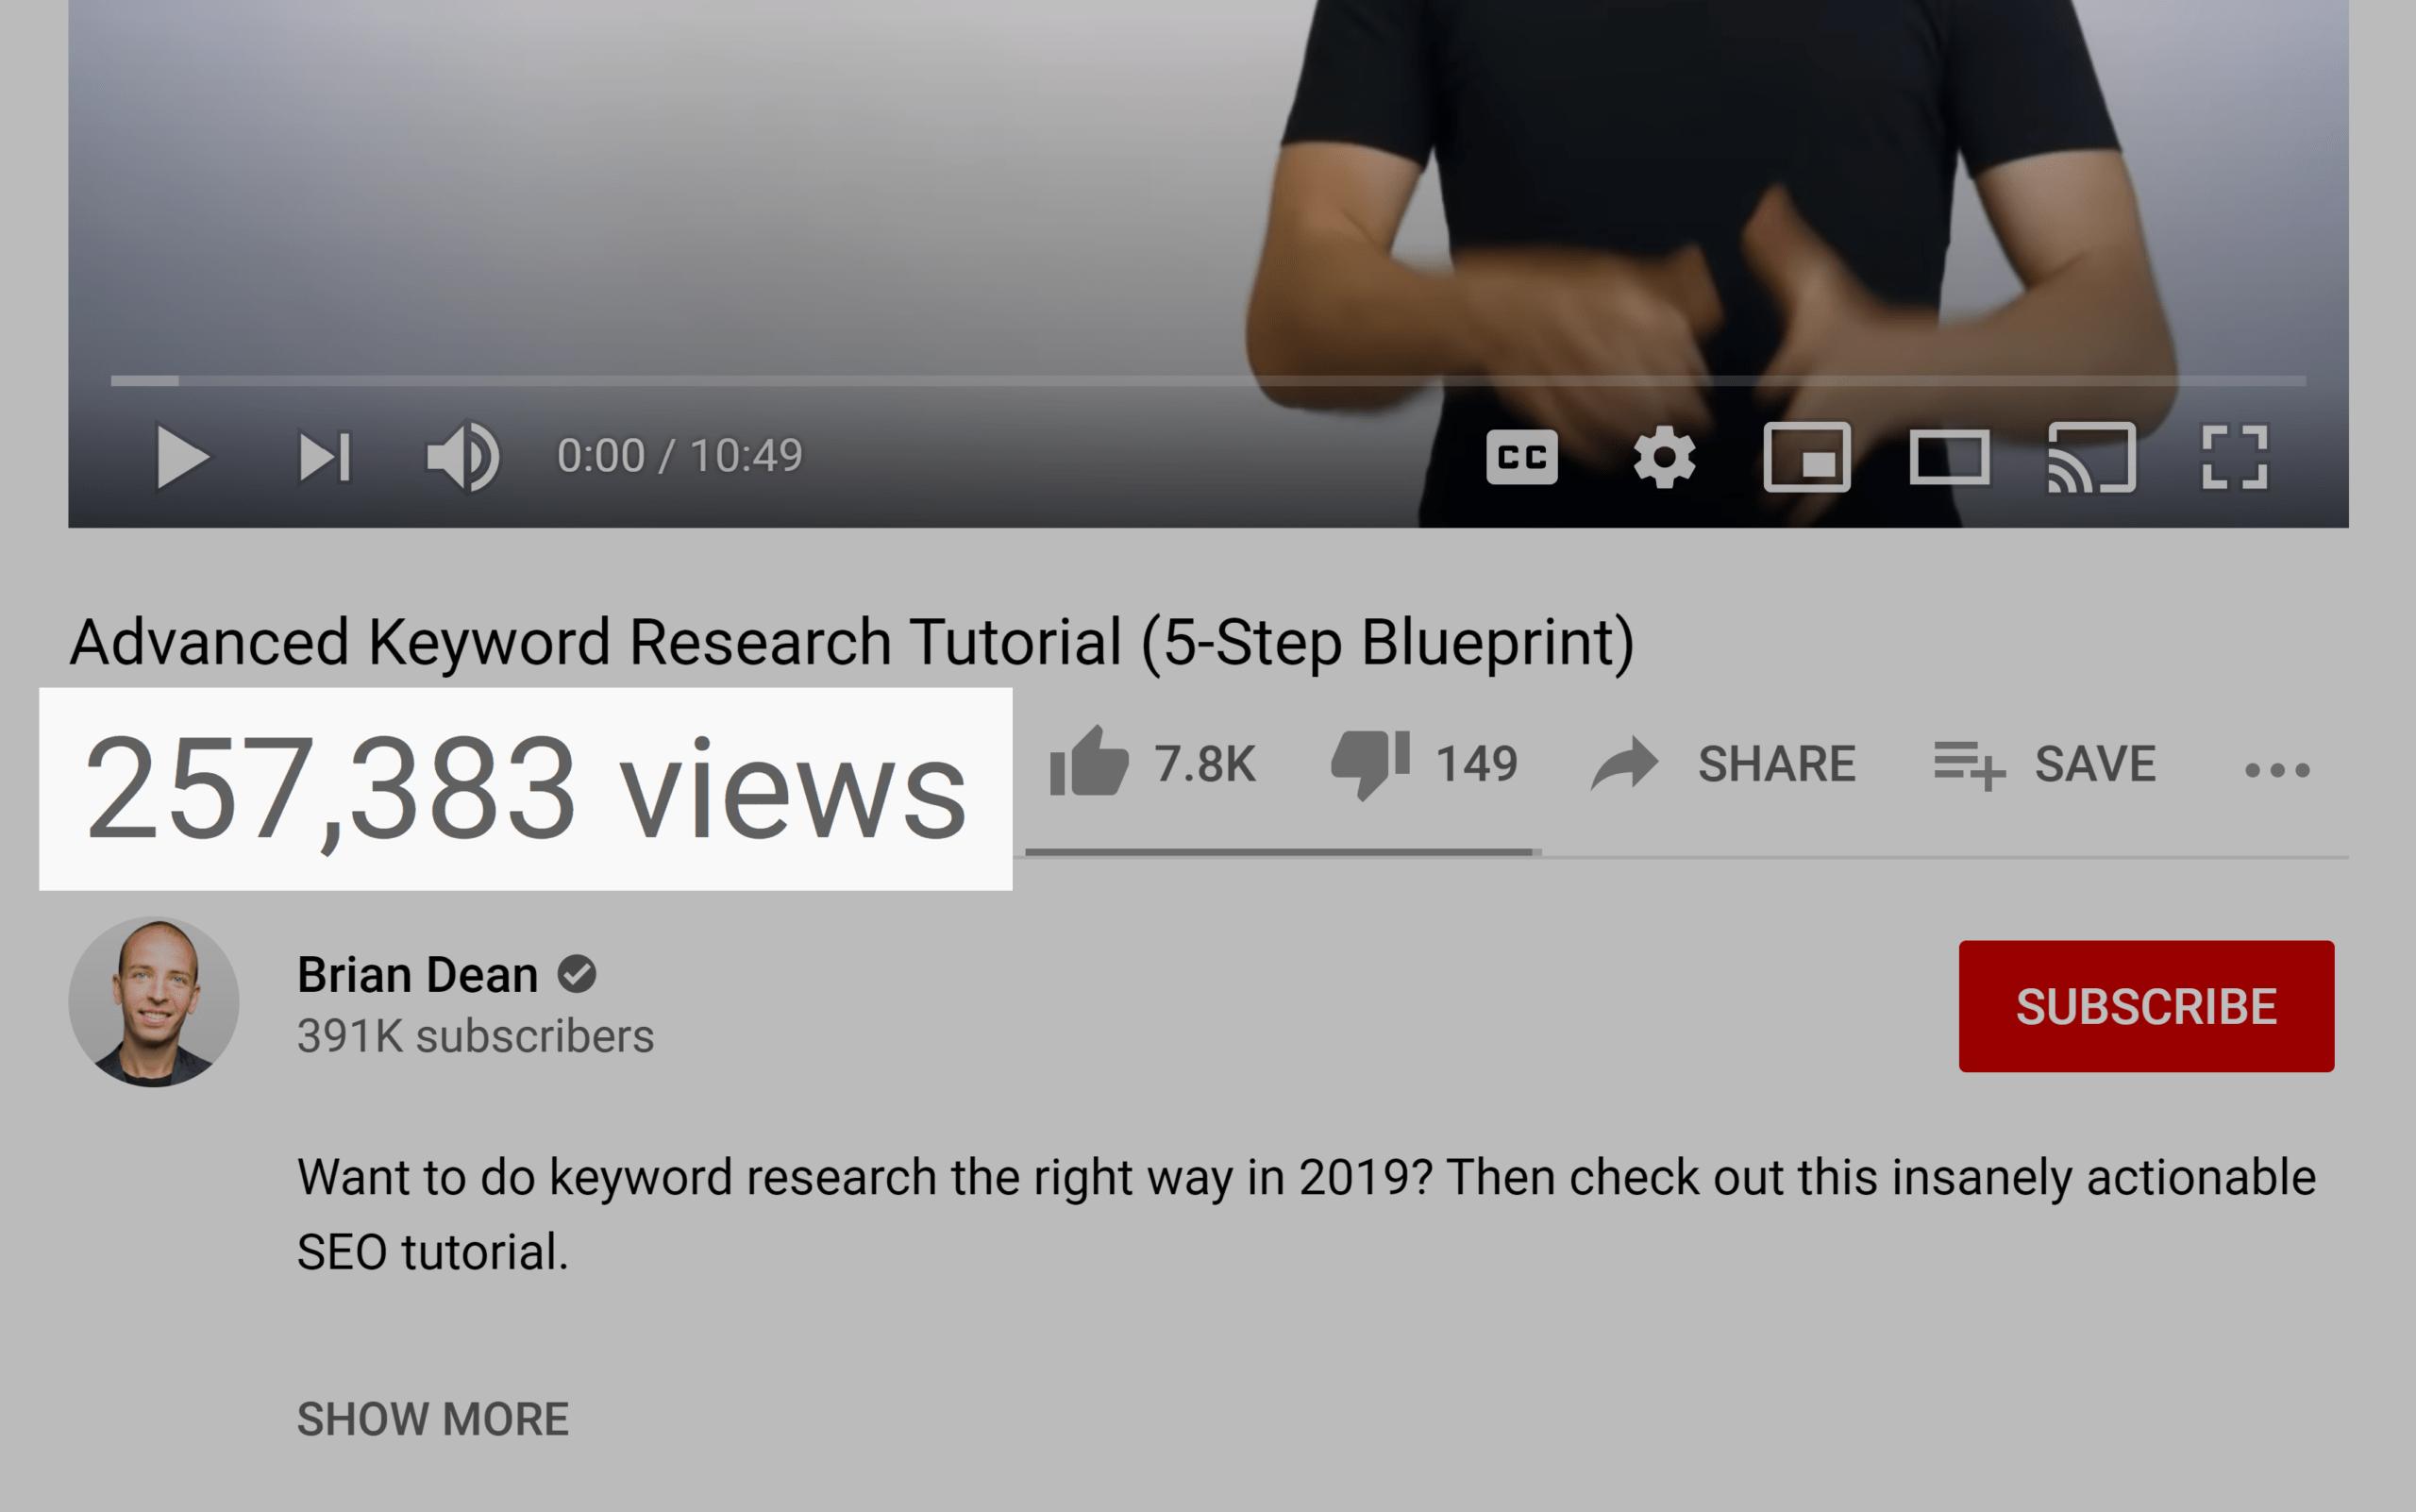 Advanced keyword research – Video views